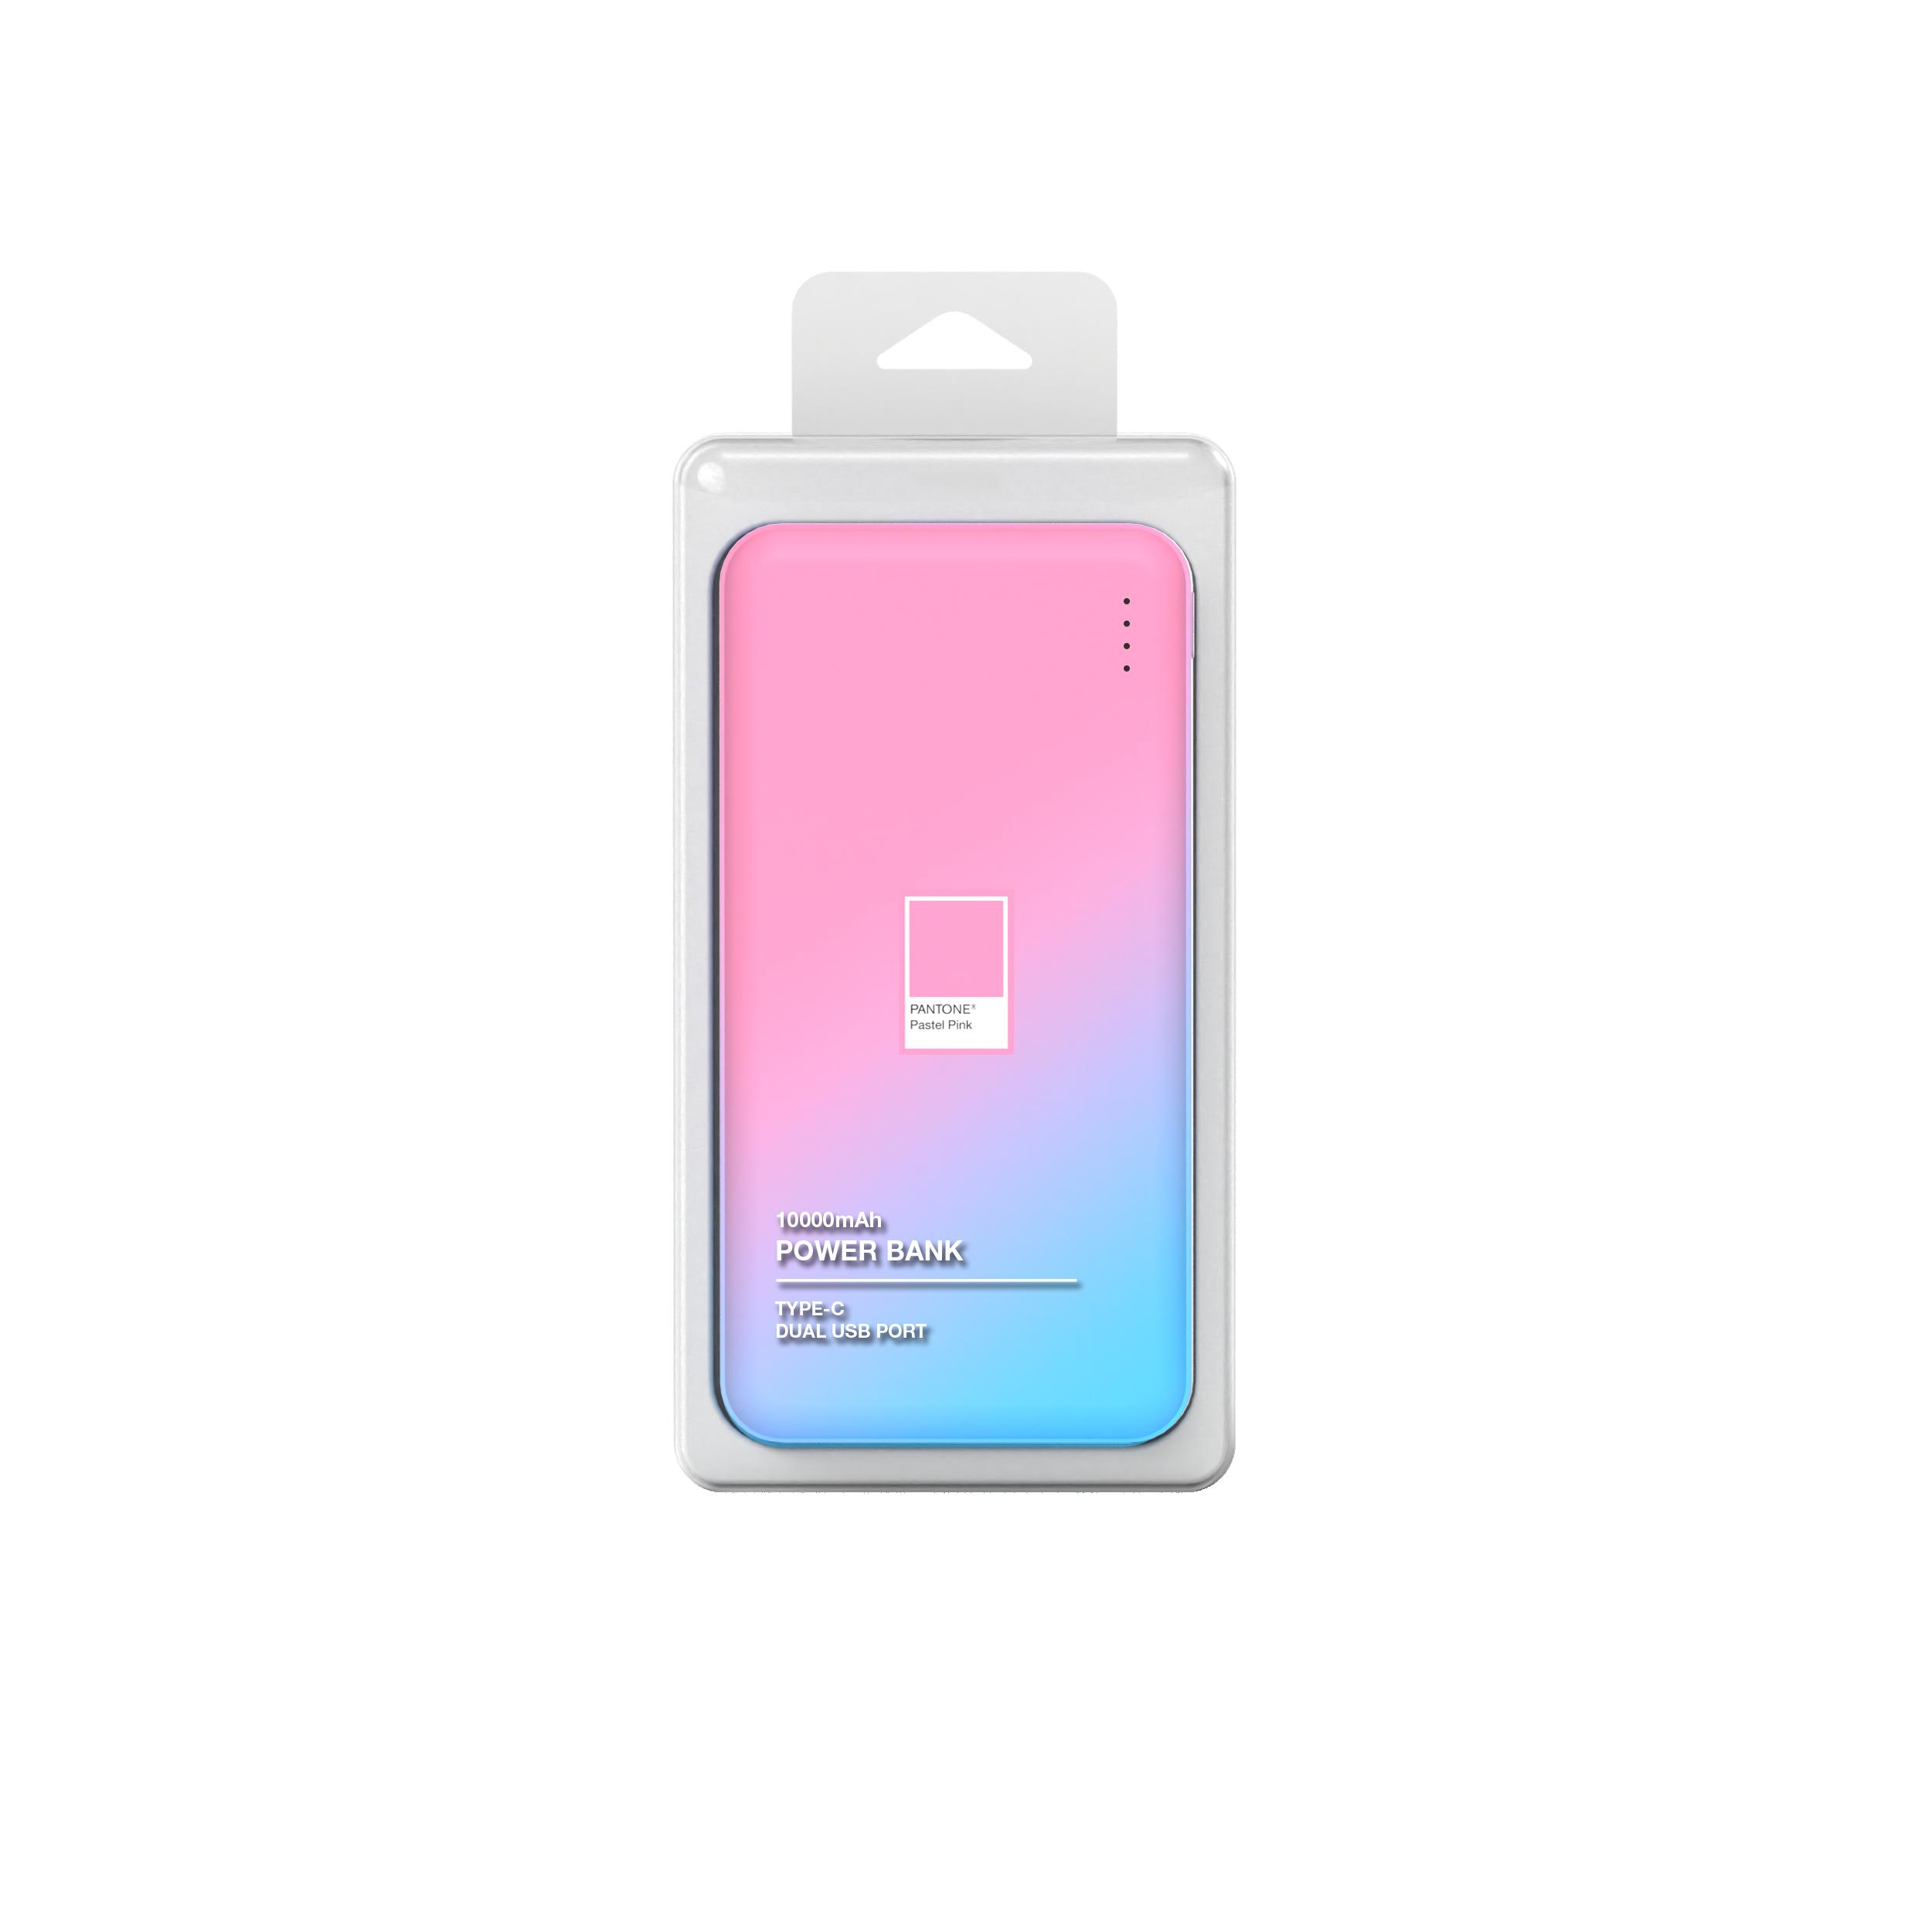 PANTONE 고속충전 보조배터리 10000mAh 멀티단자, PGB-01, 핑크